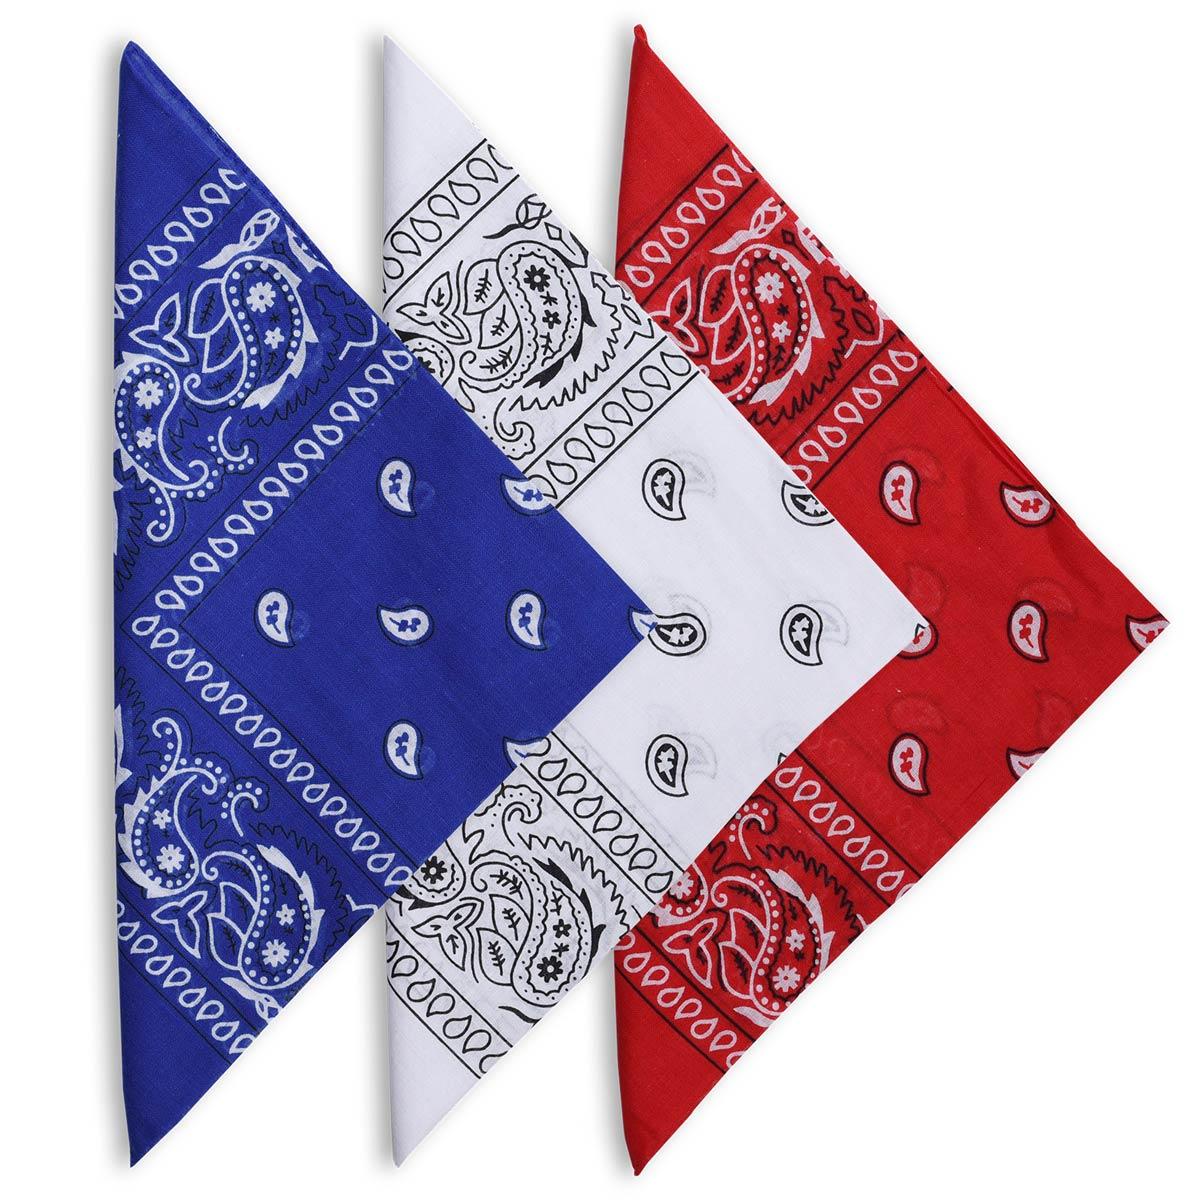 AT-06014-A12-lot-bandanas-tricolore